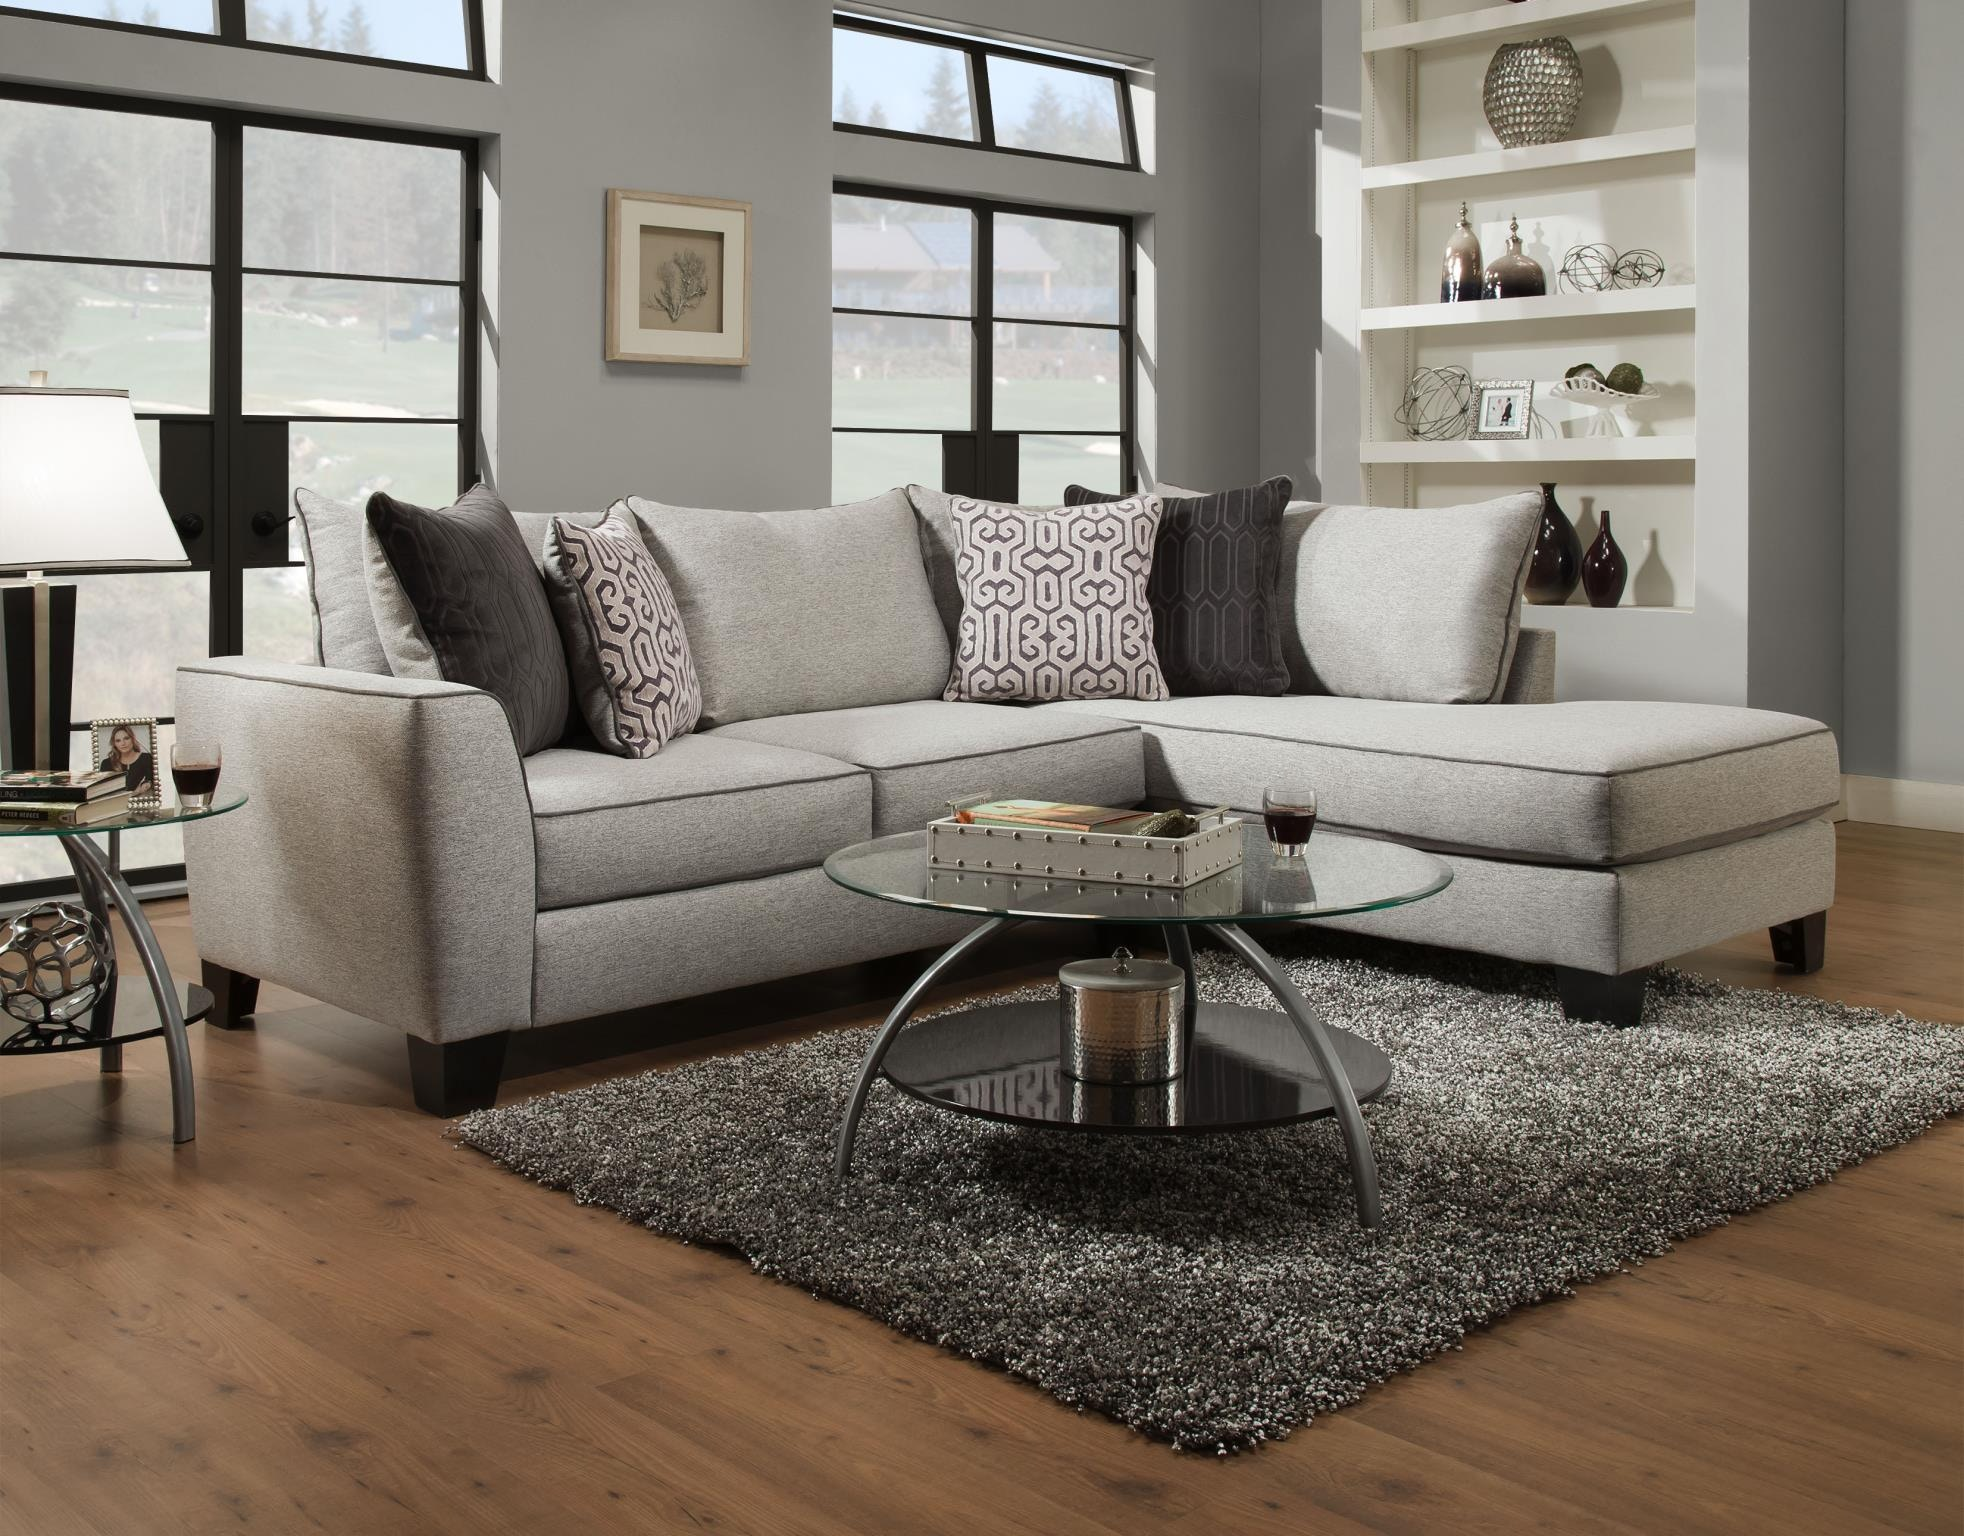 Genial Albany Trounce LAF Sofa 000008369460 At Gustafsonu0027s Furniture And Mattress